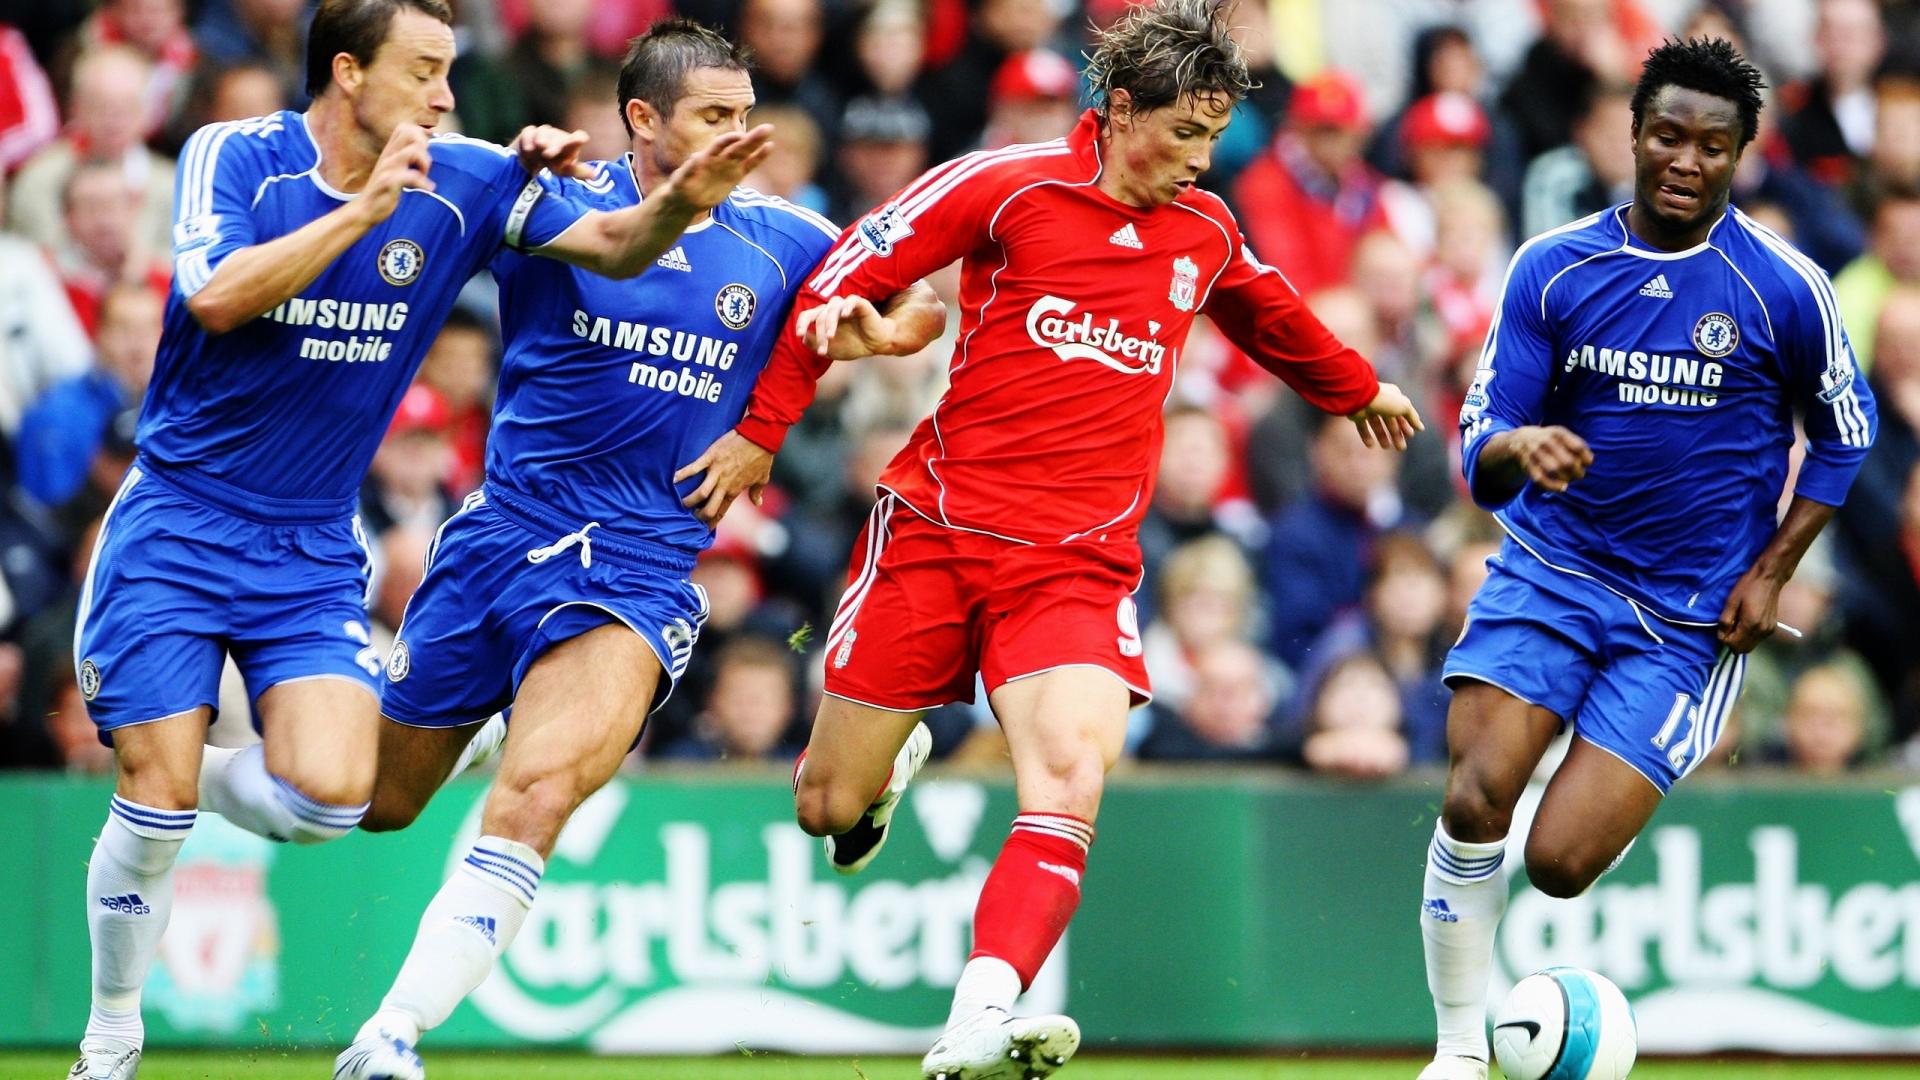 Football Club Liverpool 1920 X 1080 HDTV 1080p Wallpaper